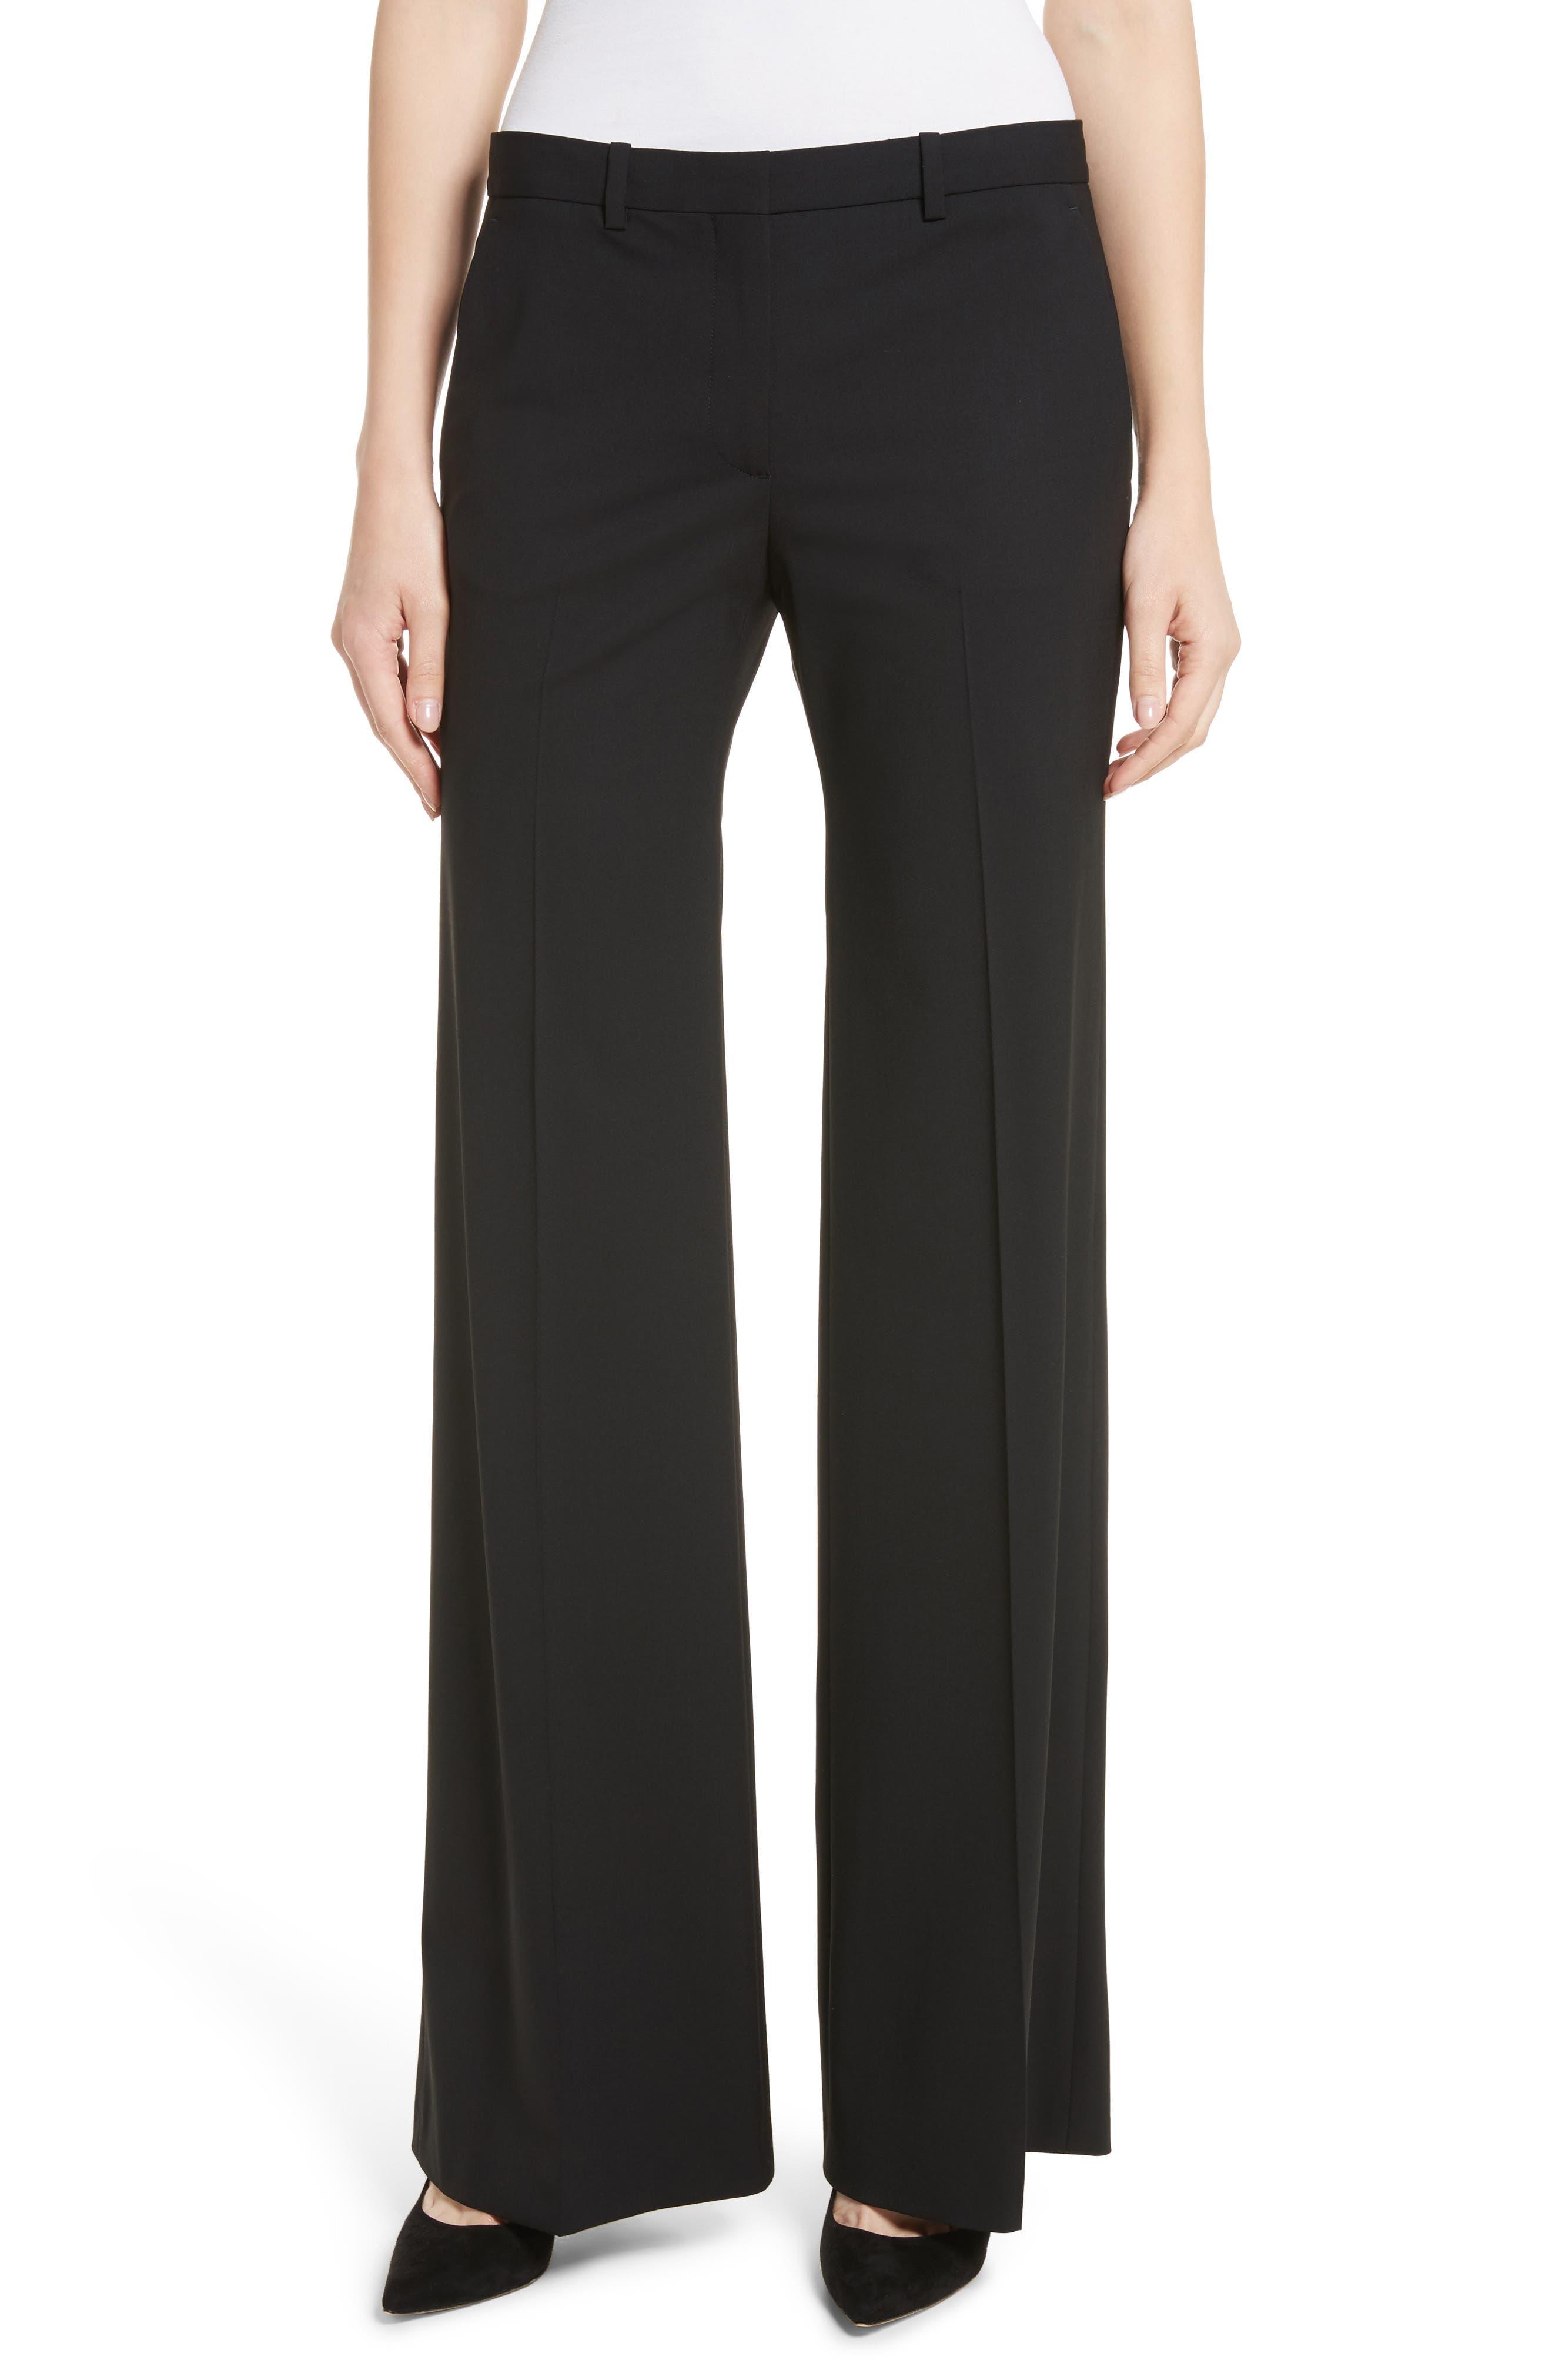 THEORY Demetria 2 Flare Leg Good Wool Suit Pants, Main, color, BLACK